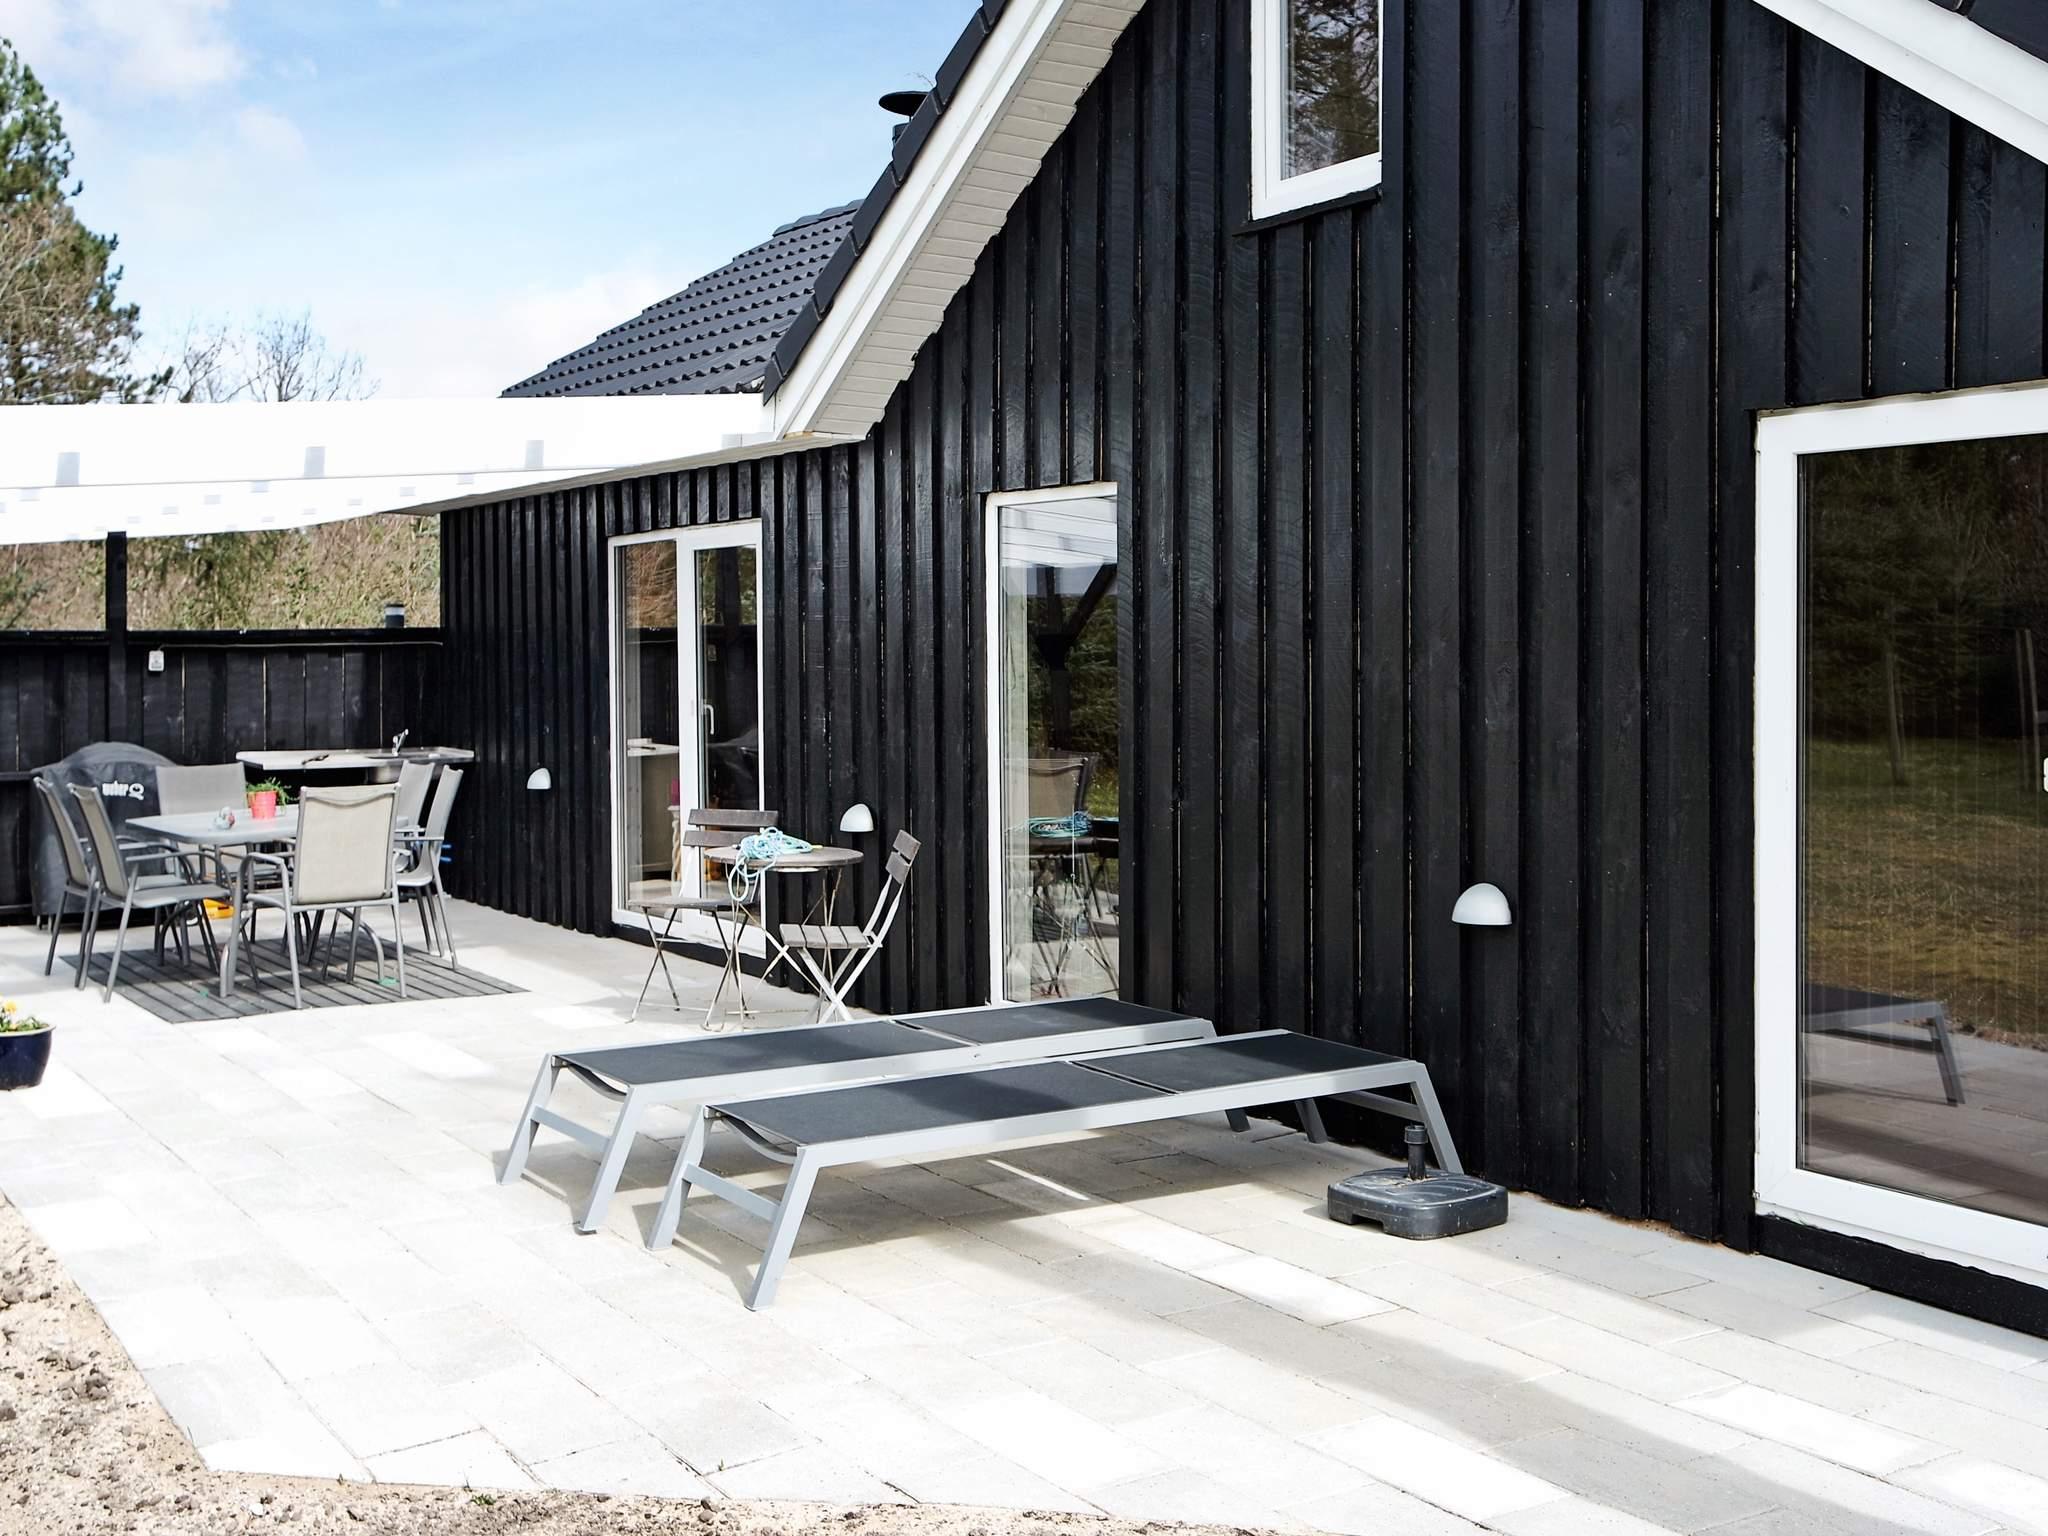 Ferienhaus Øster Hurup (88055), Øster Hurup, , Ostjütland, Dänemark, Bild 16